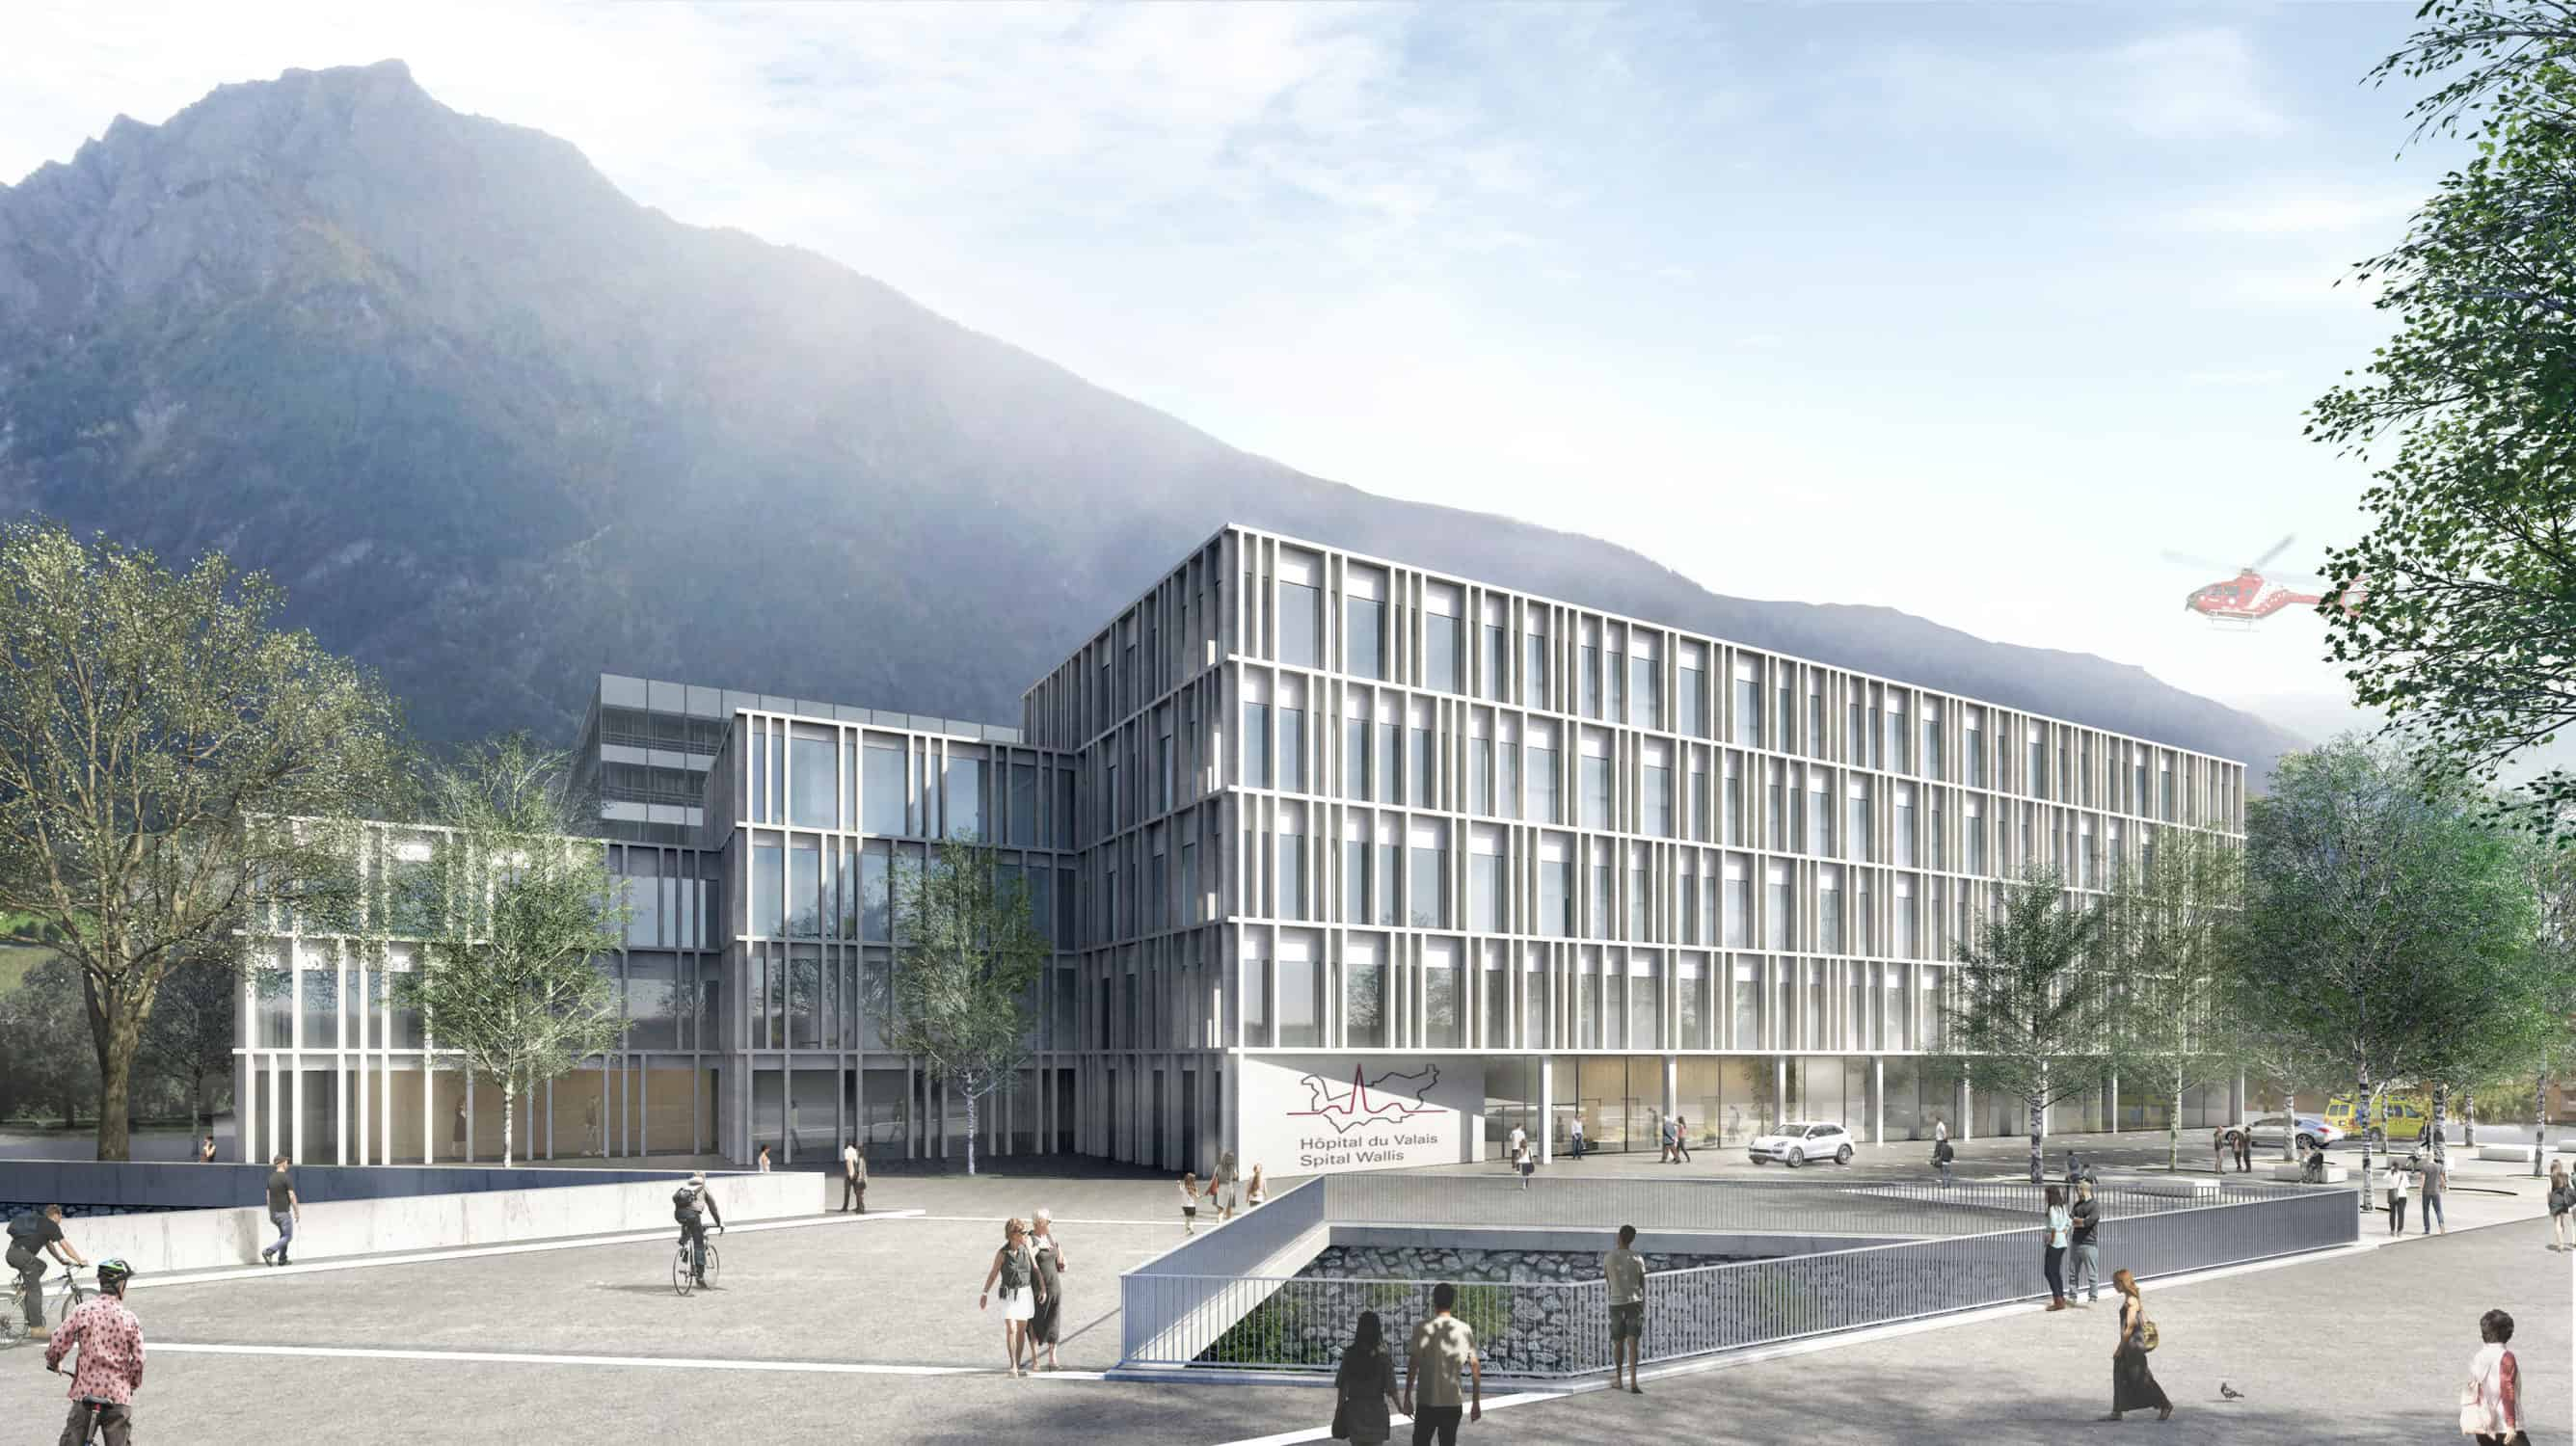 Spitalzentrum Oberwallis, Brig